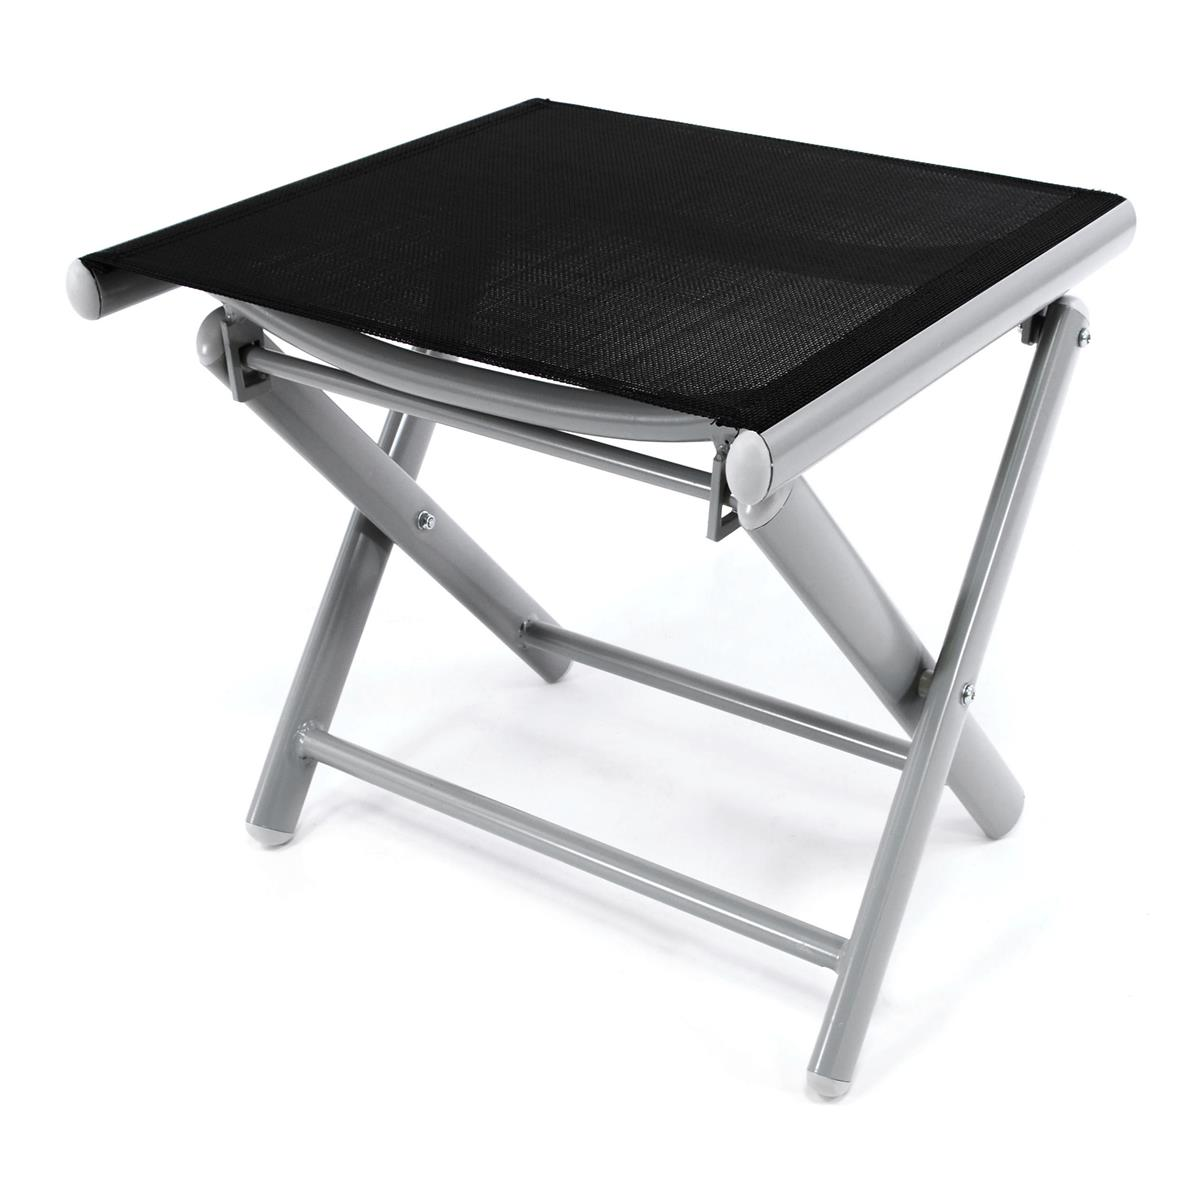 Alu Hocker klappbar Sitzhocker - Textilene schwarz Rahmen hellgrau - Sitzhocker